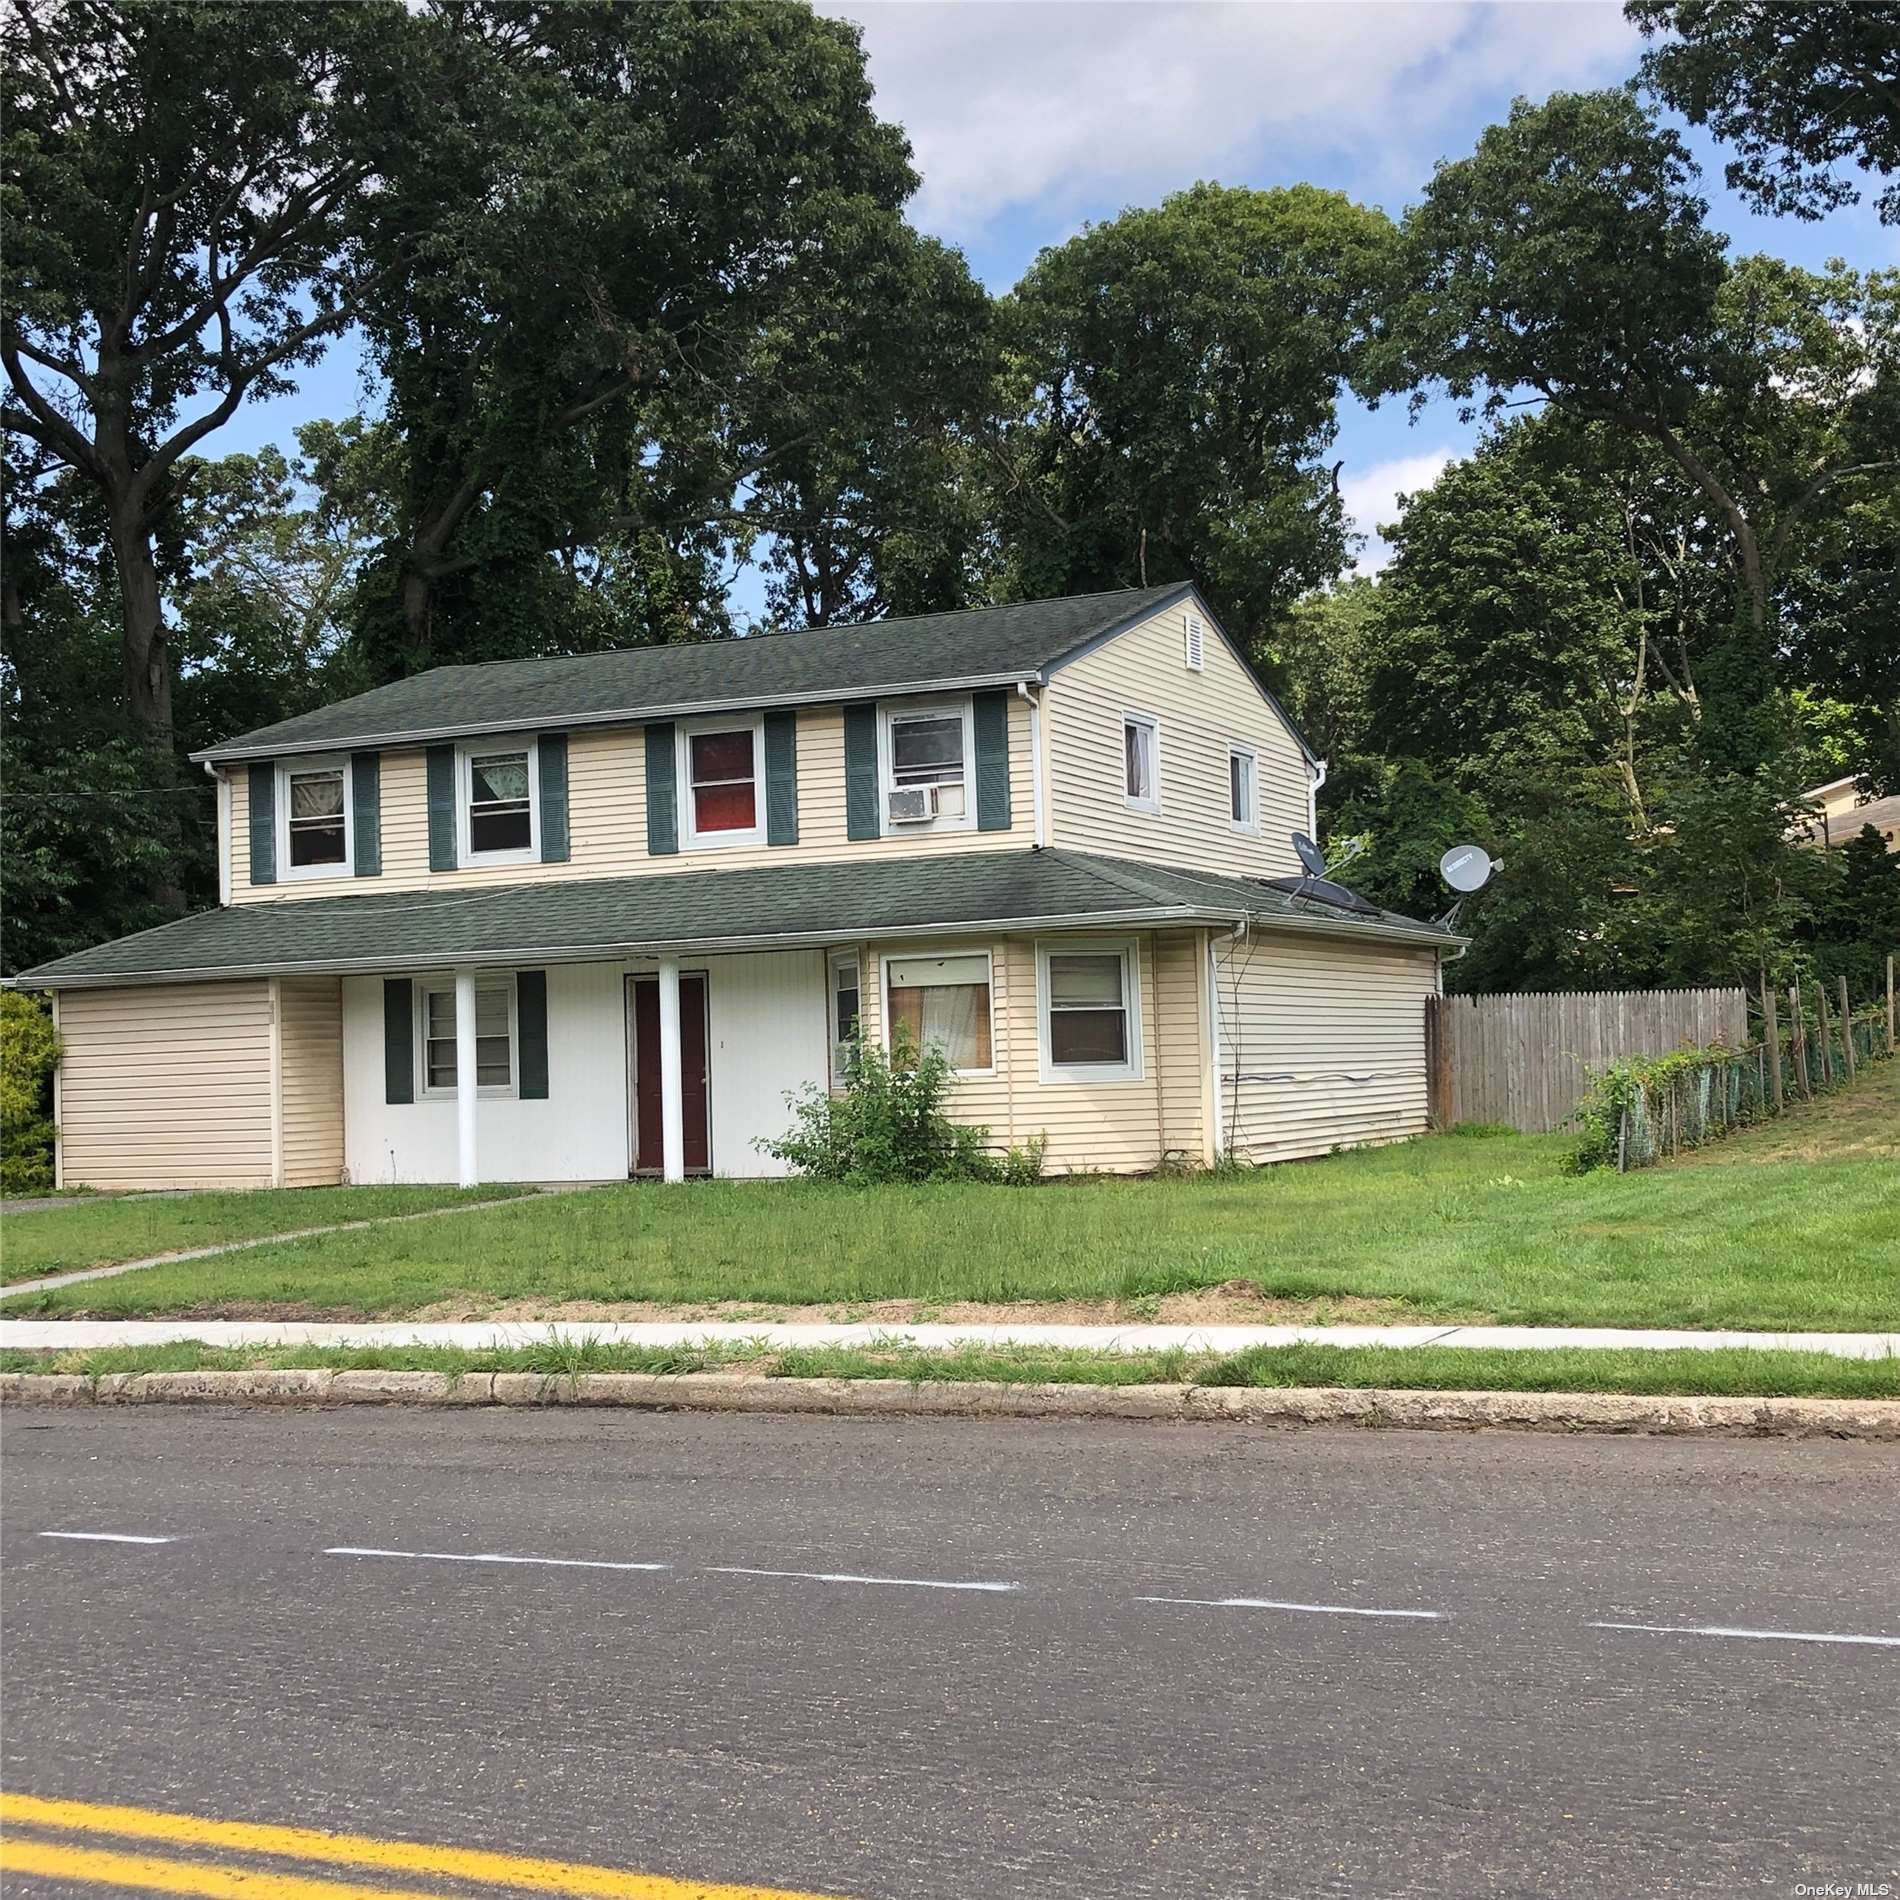 Photo of 41 College Road, Selden, NY 11784, Selden, NY 11784